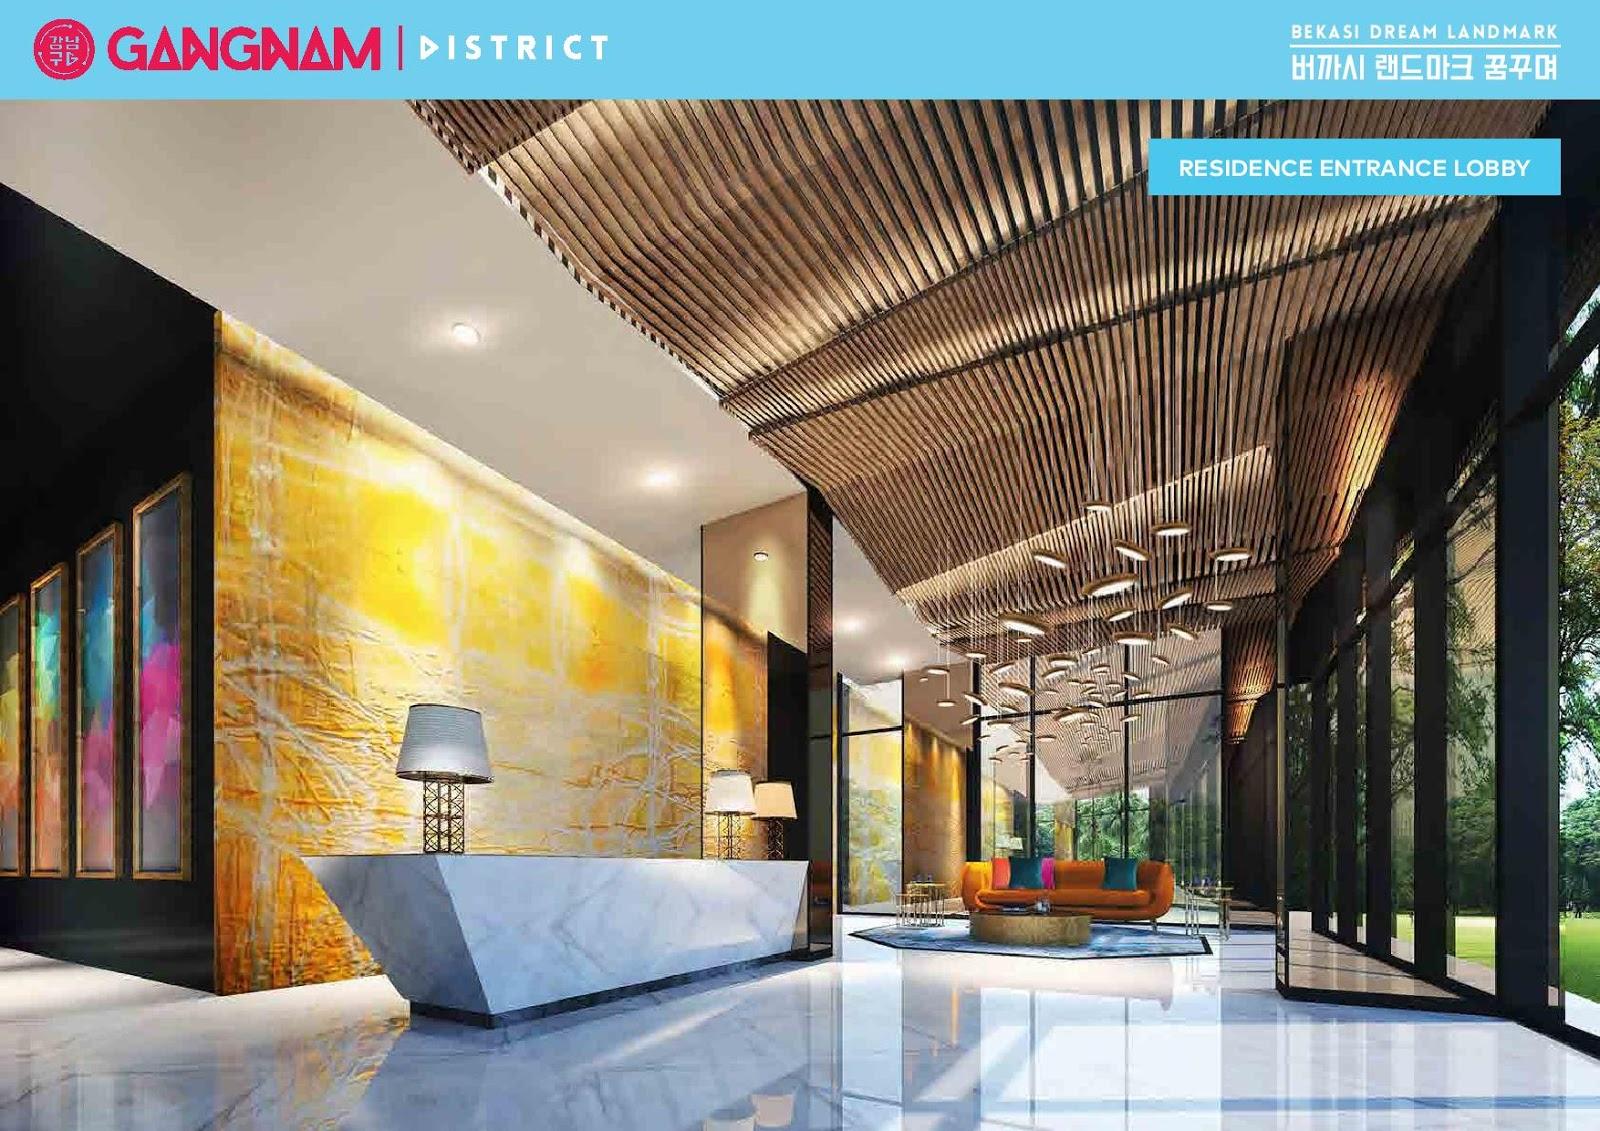 Galary Apartemen Gangnam District Bekasi